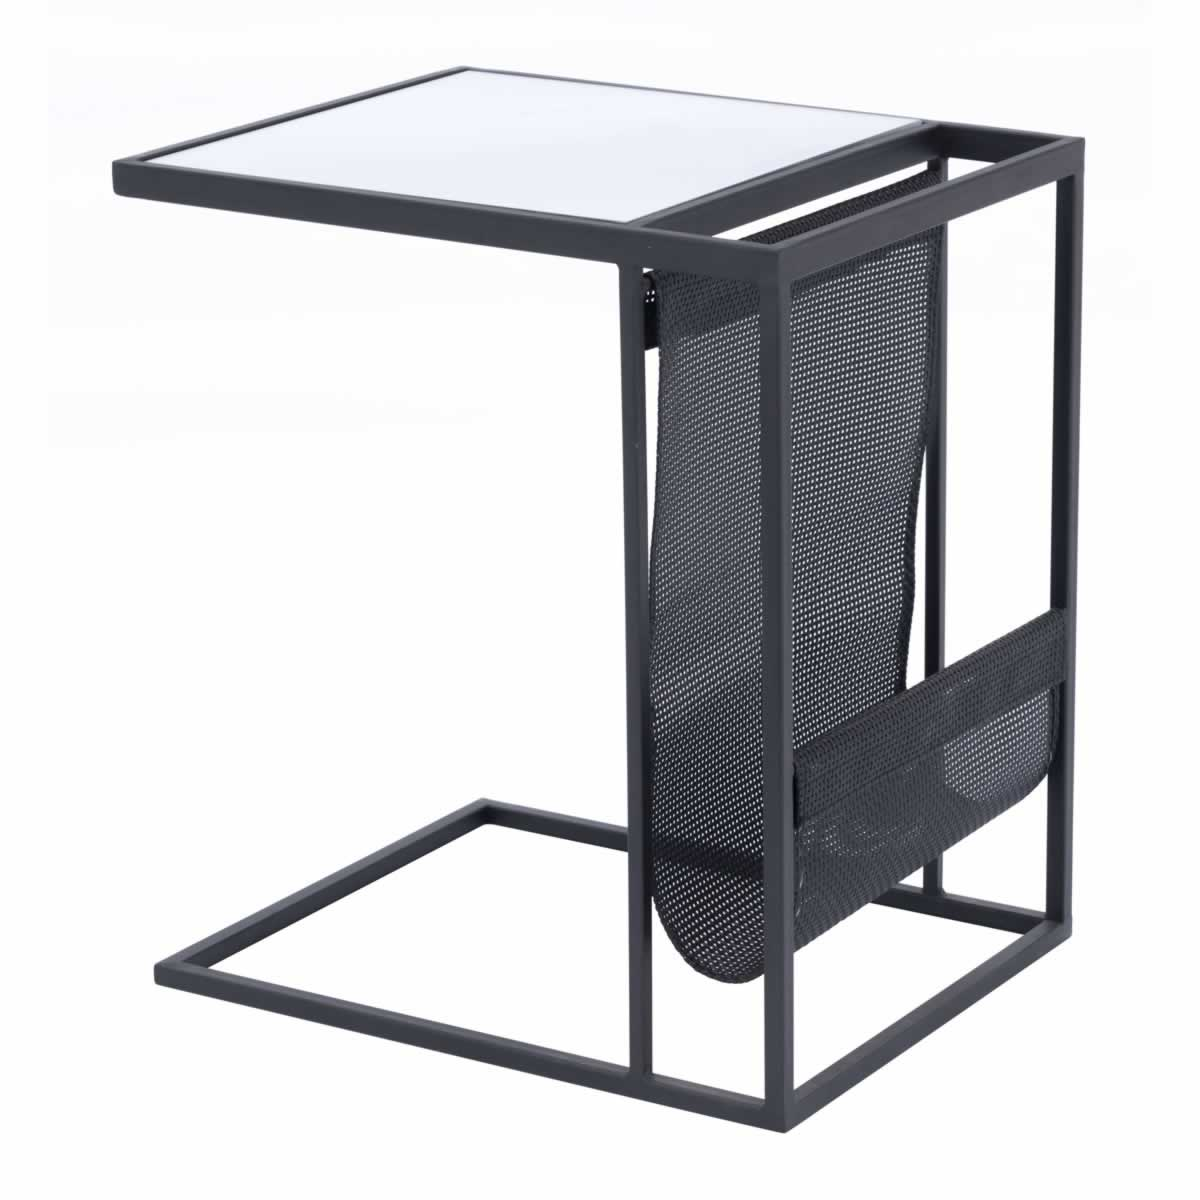 channing 7 drawer dresser mirror set picket house furnishings ch600drmr